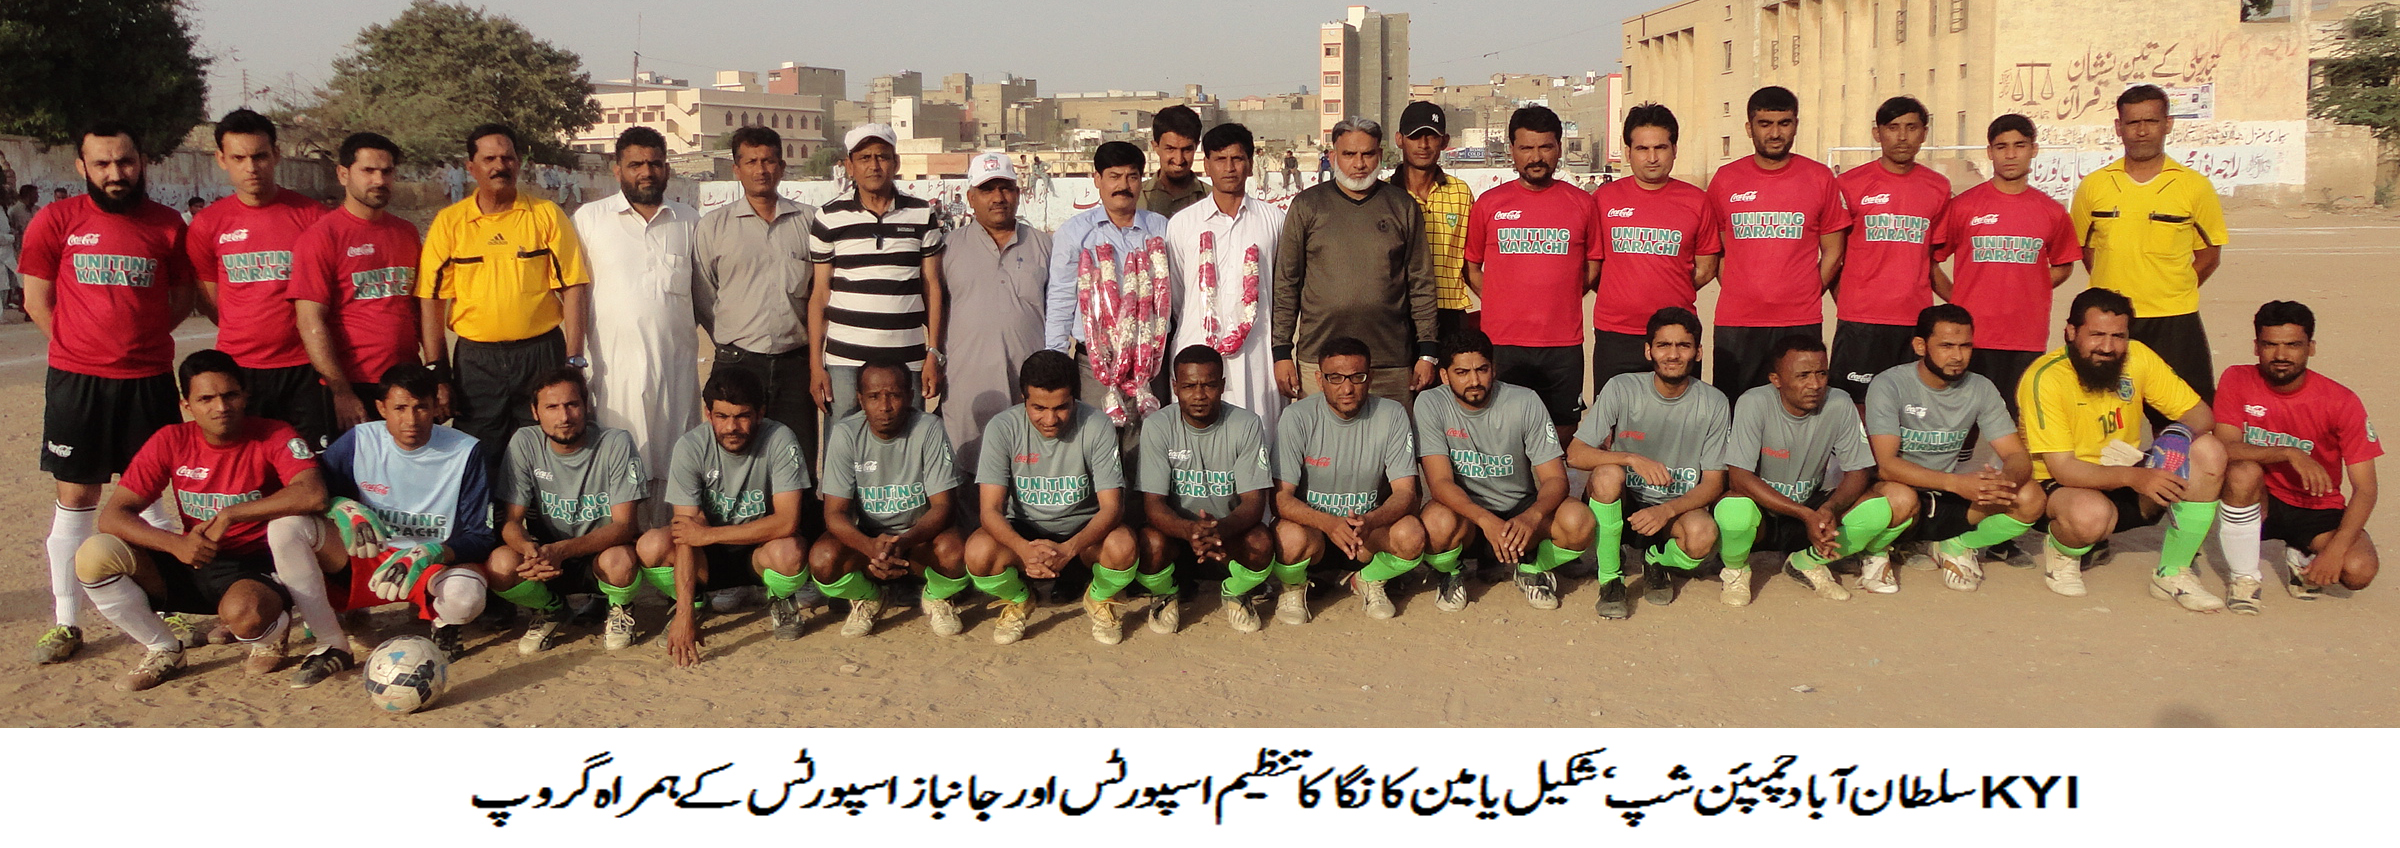 Coca-Cola Sultanabad Championship: Tanzeen Sports Gizri and Society Brothers grab wins